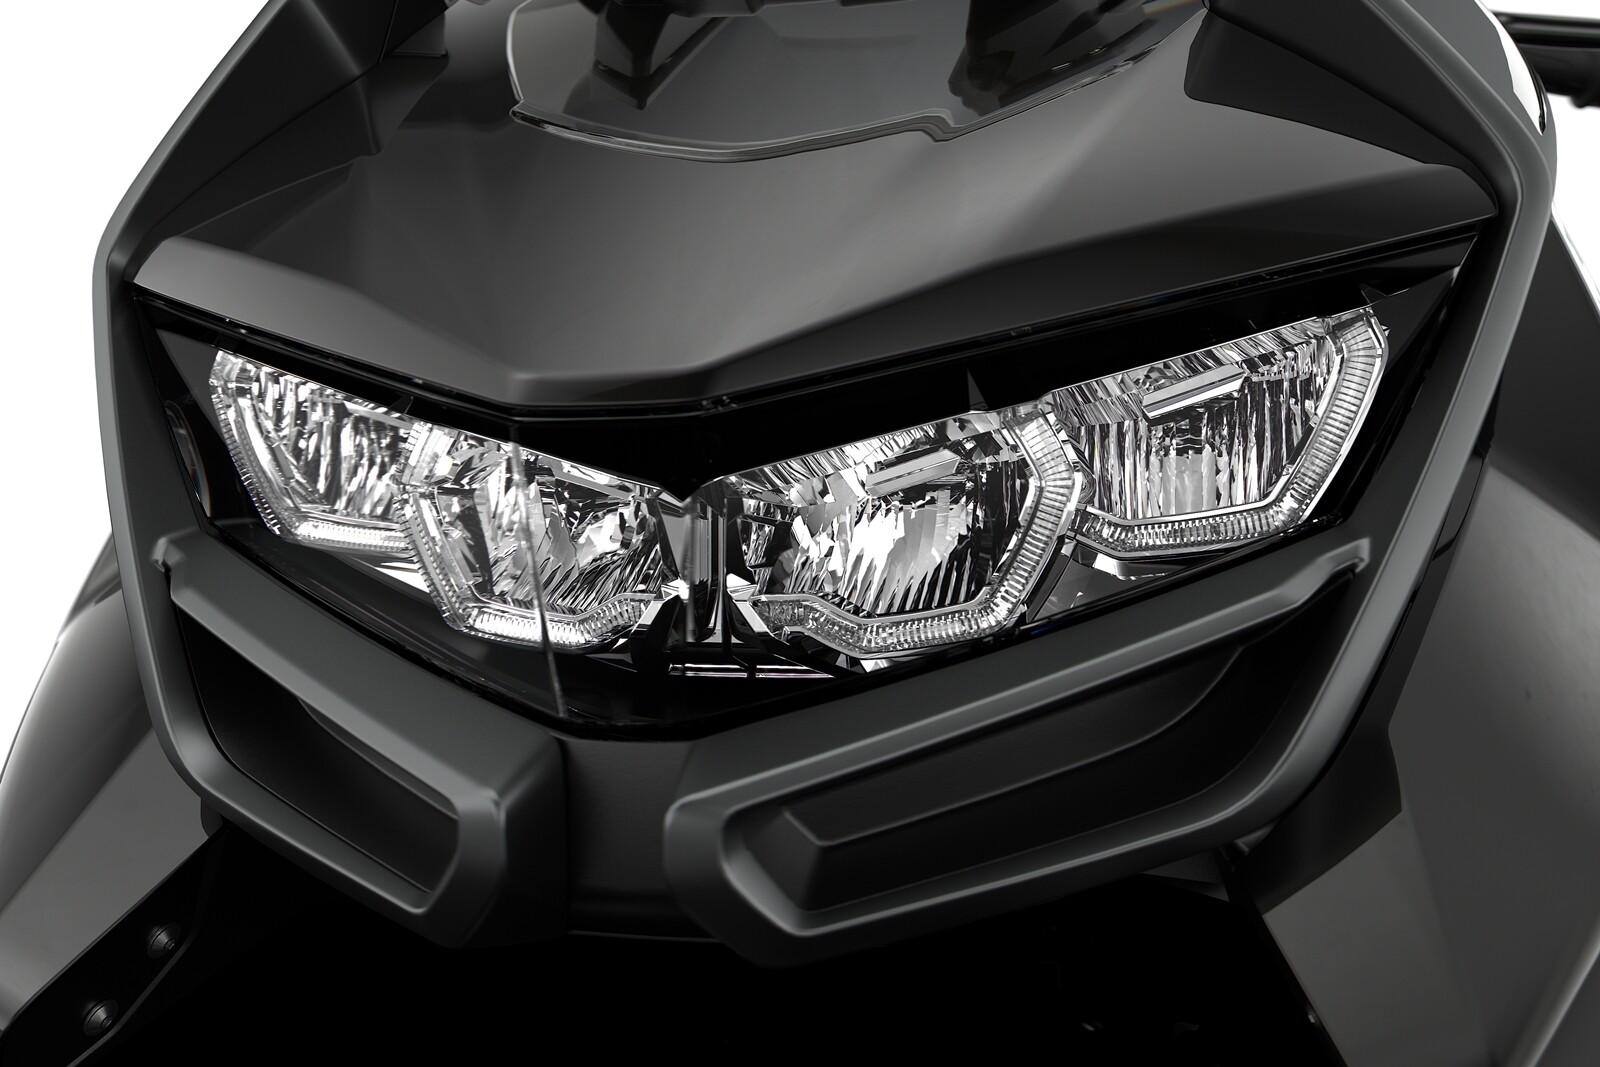 Foto de BMW C 400 X y C 400 GT 2021 (2/44)